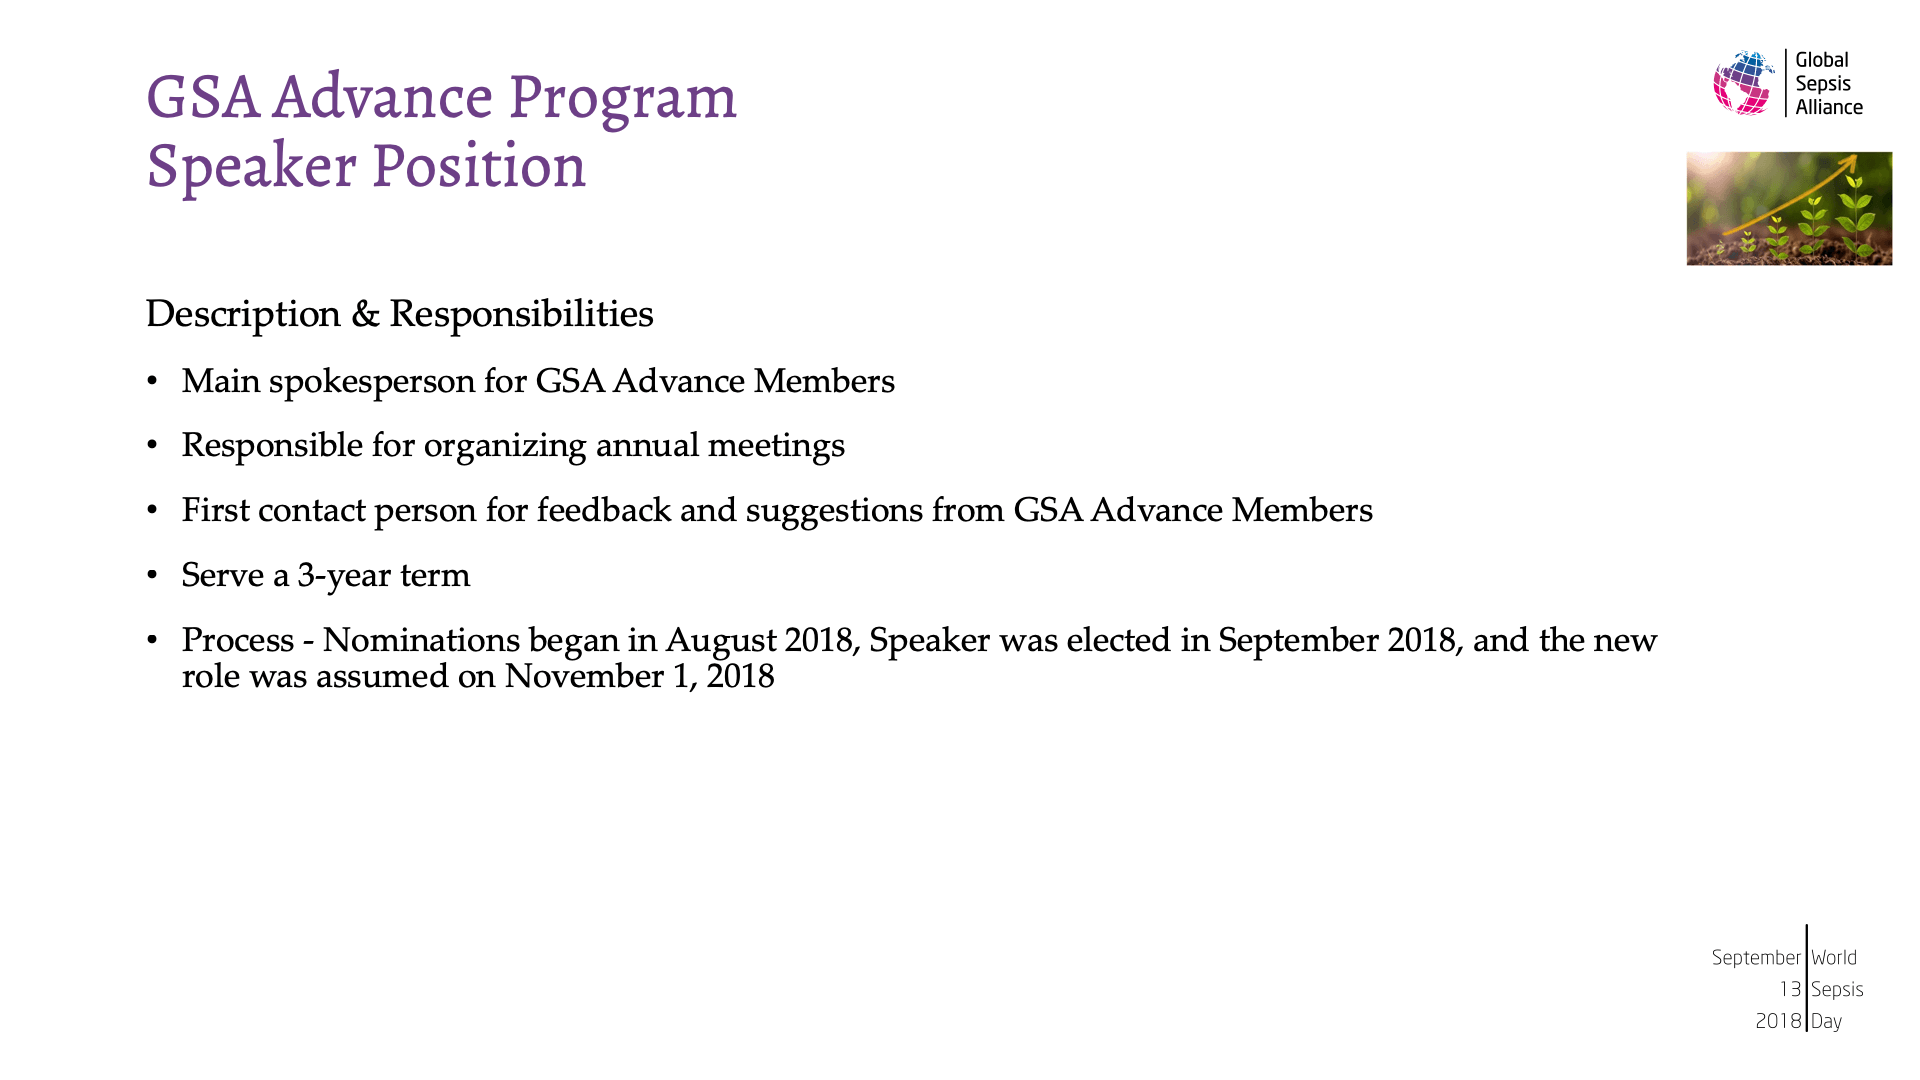 GSA Advance ESICM 2018 17.png